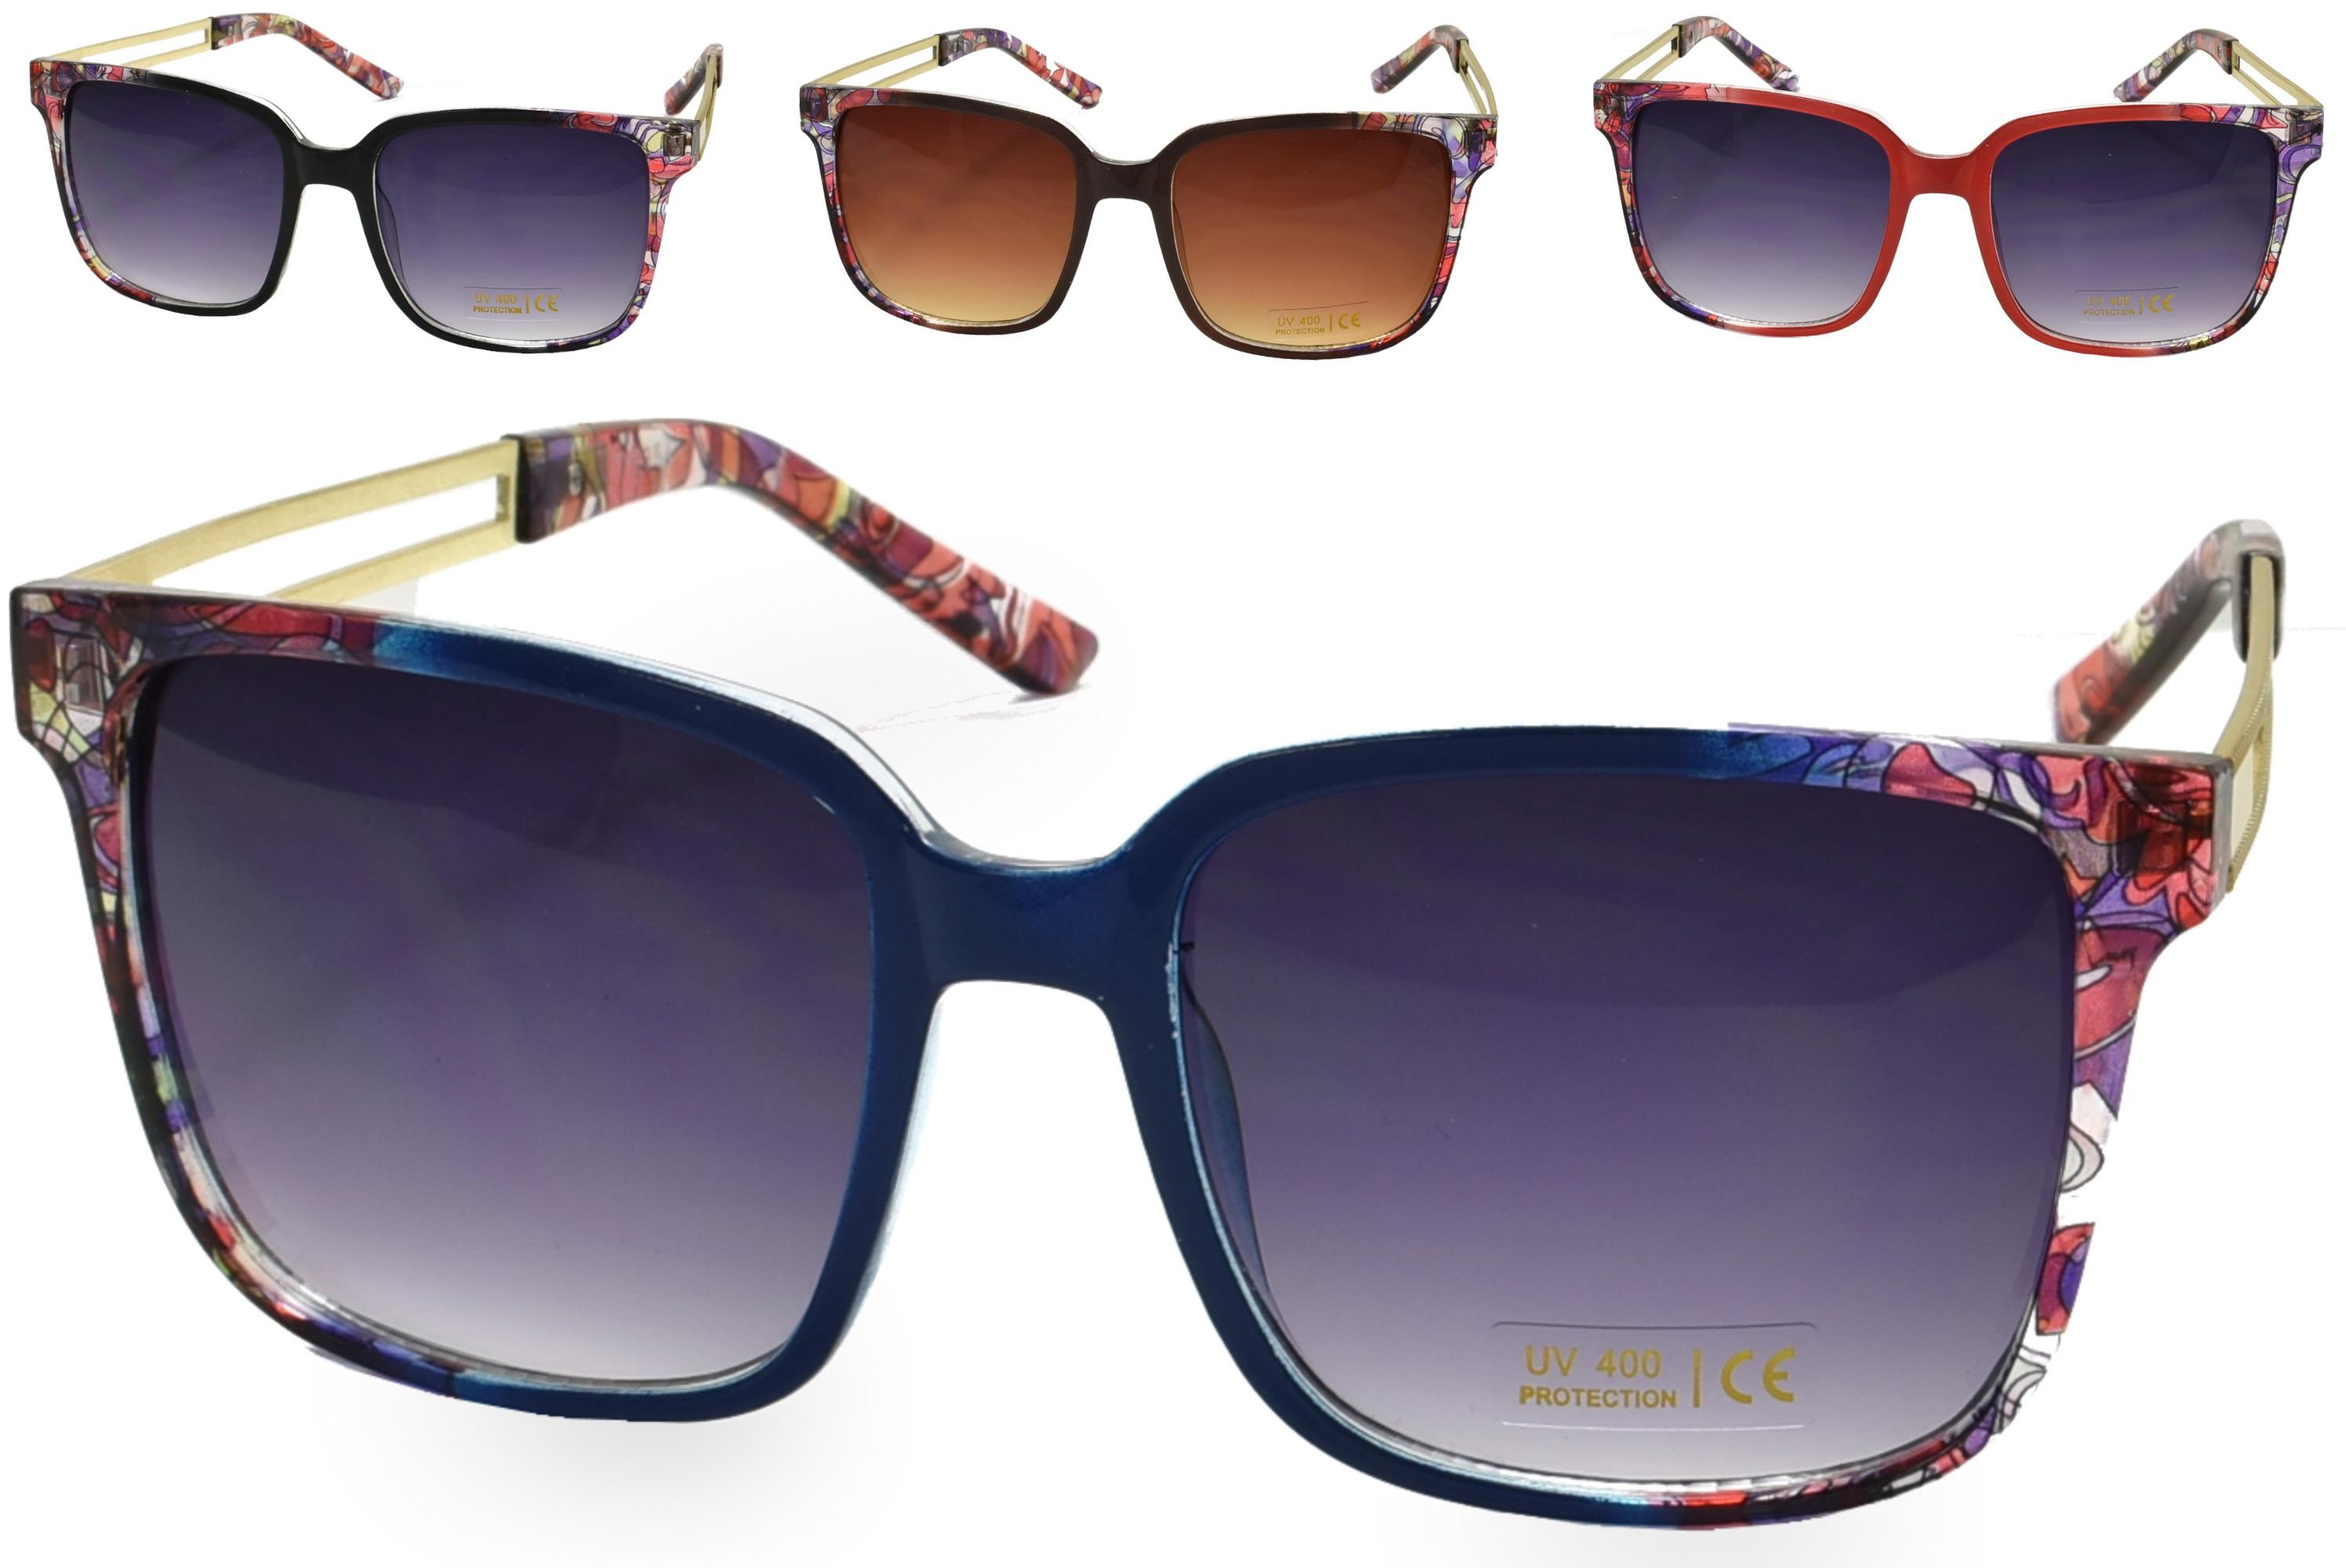 Ladies Metal Arm Sunglasses - 4 Assorted